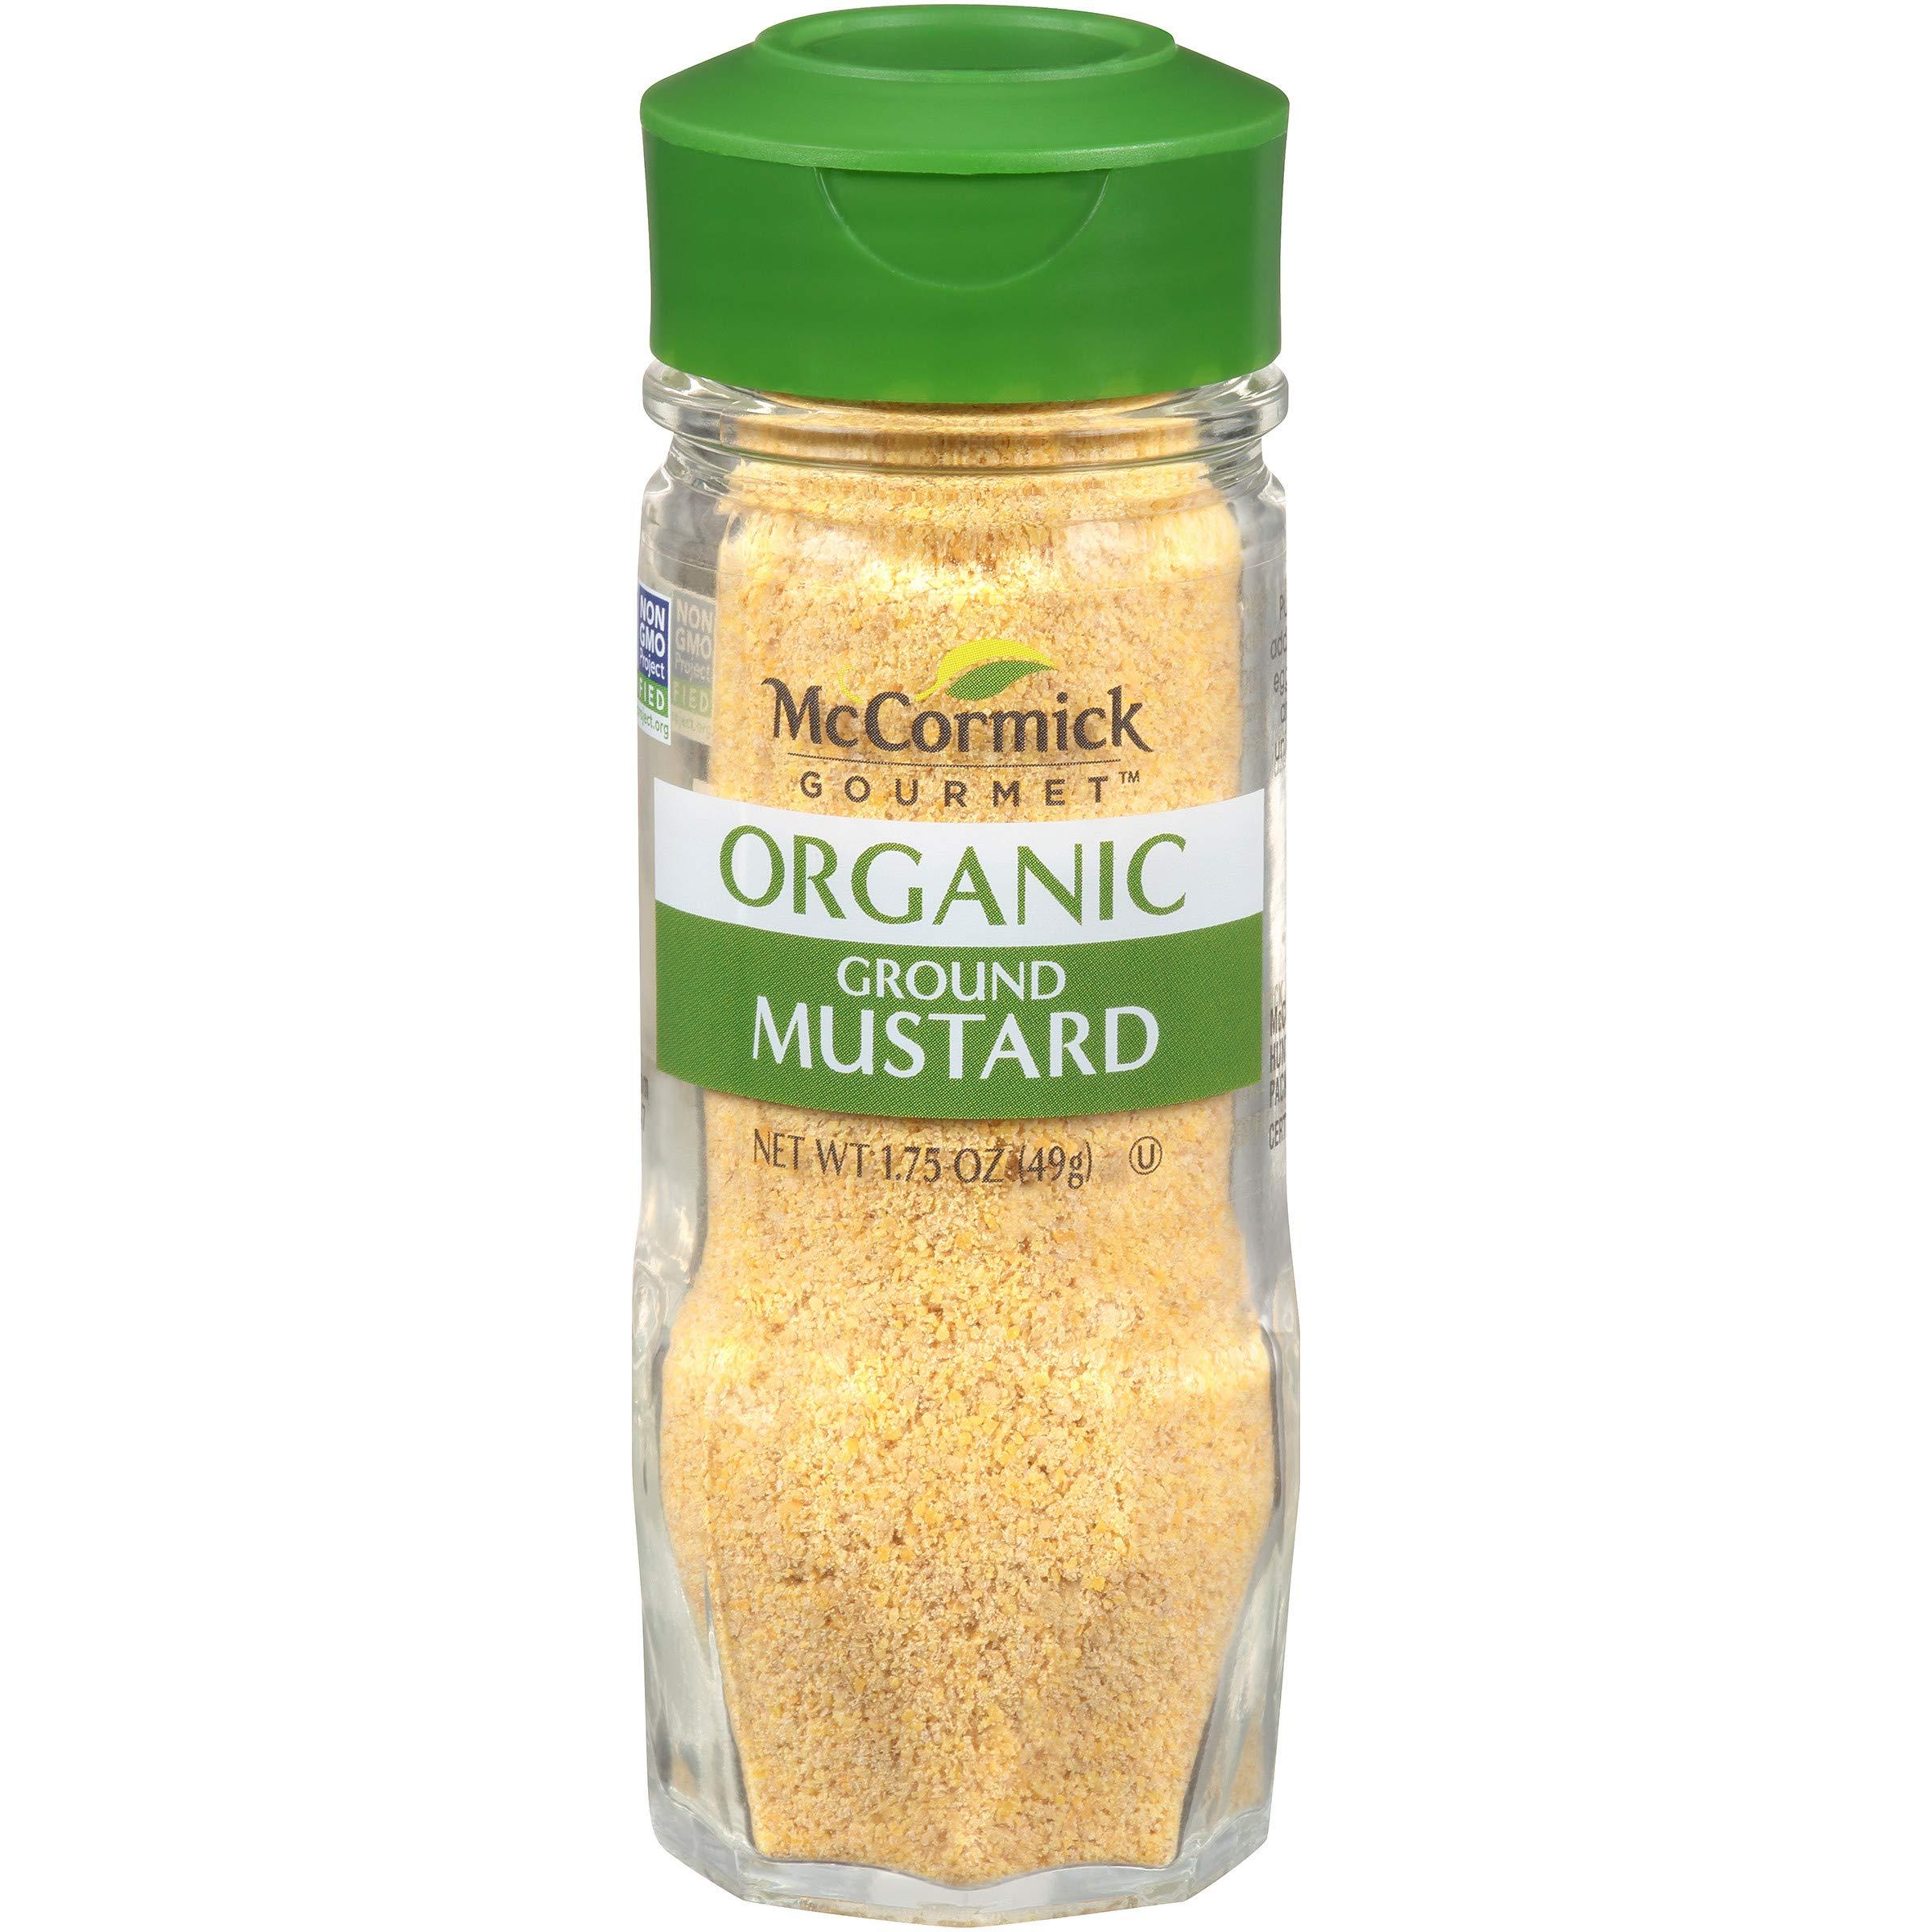 McCormick Gourmet Organic Ground Mustard, 1.75 oz